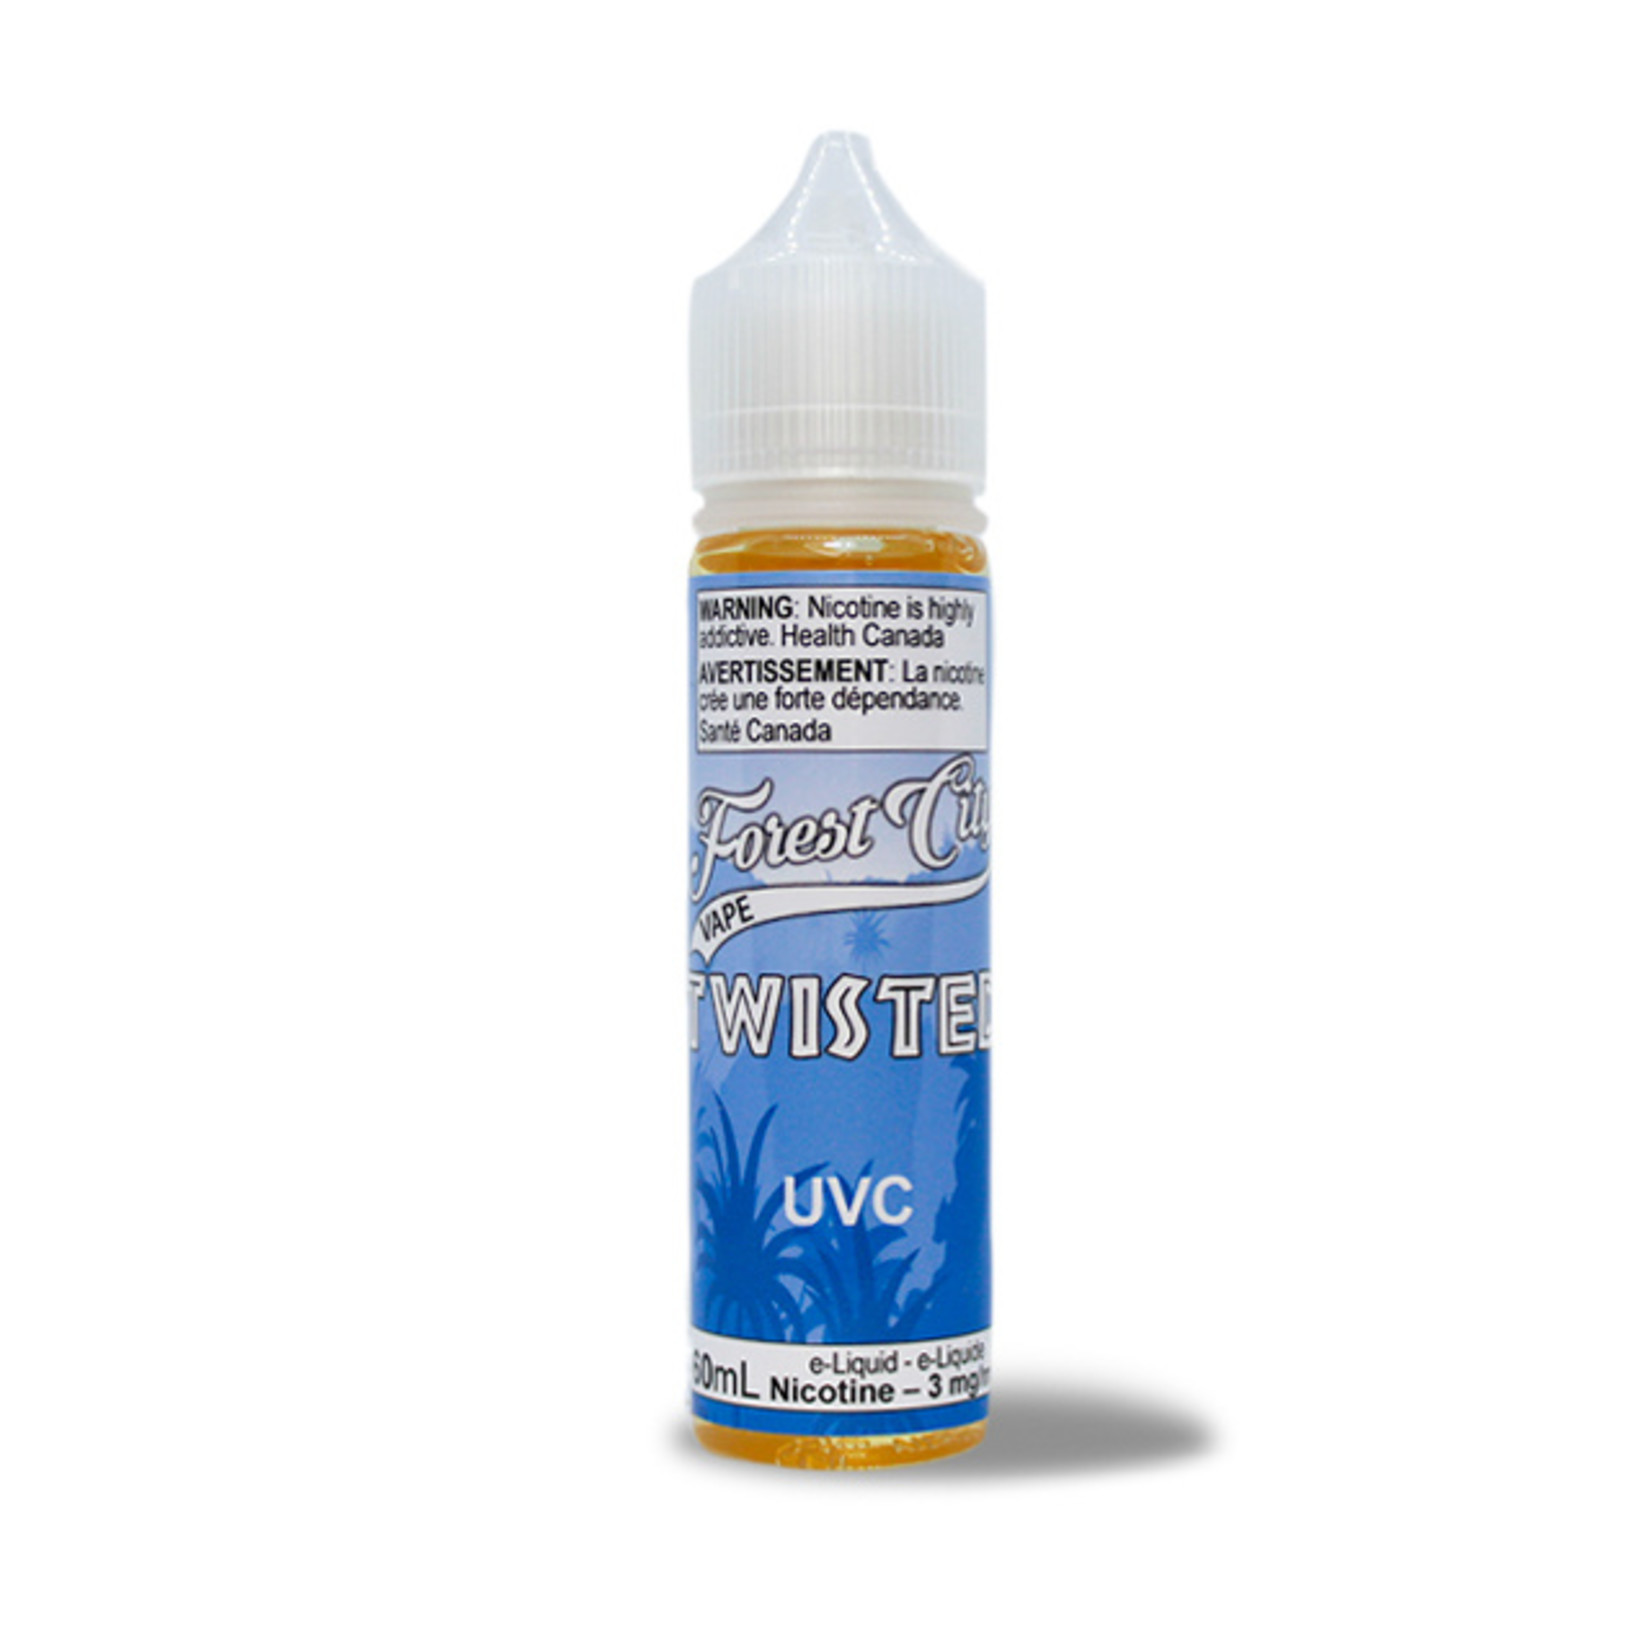 Twisted UVC